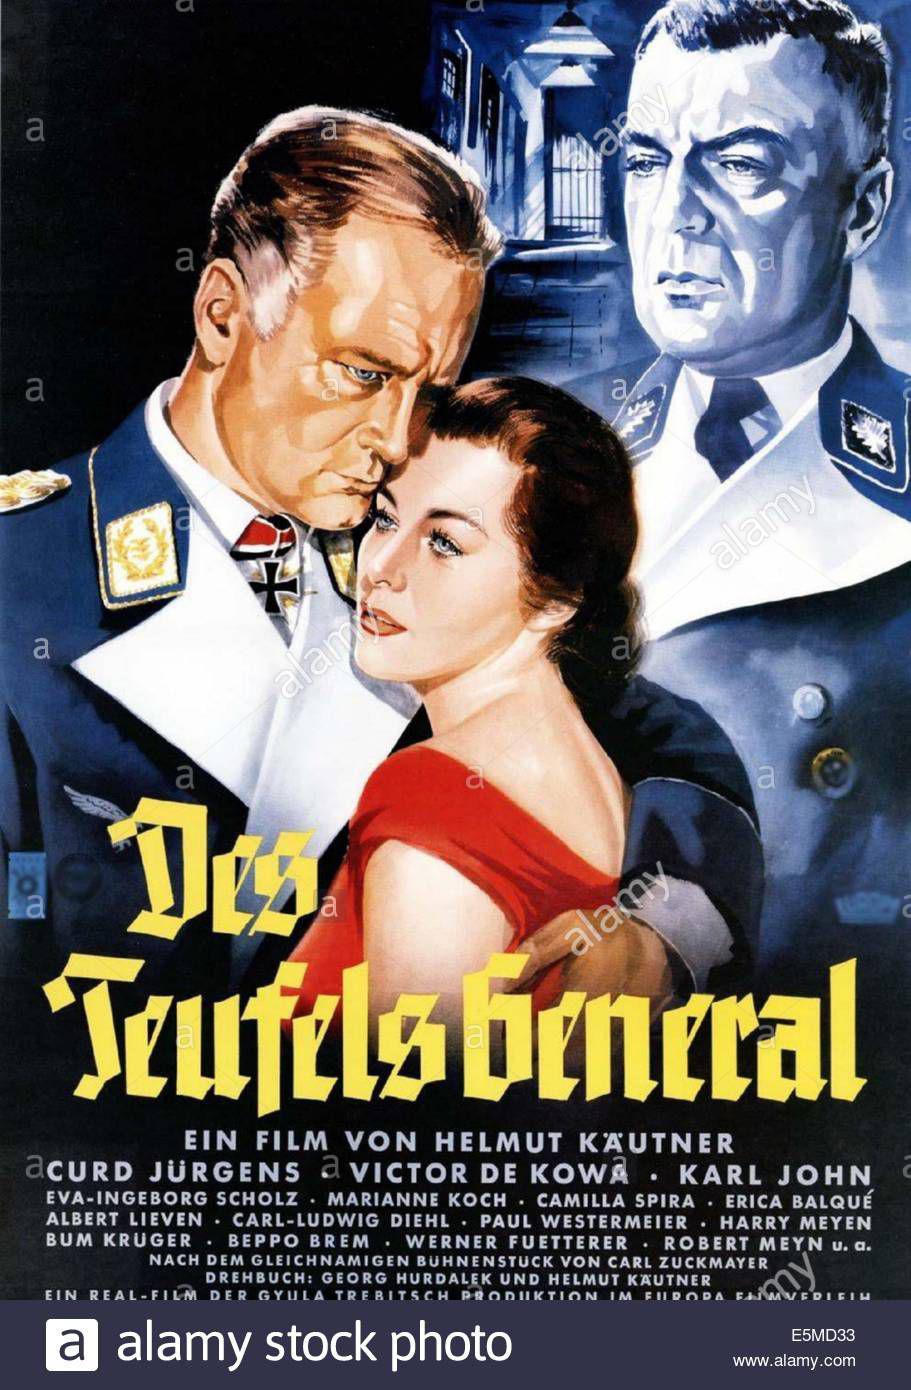 the-devils-general-aka-des-teufels-generalgerman-poster-art-curd-jurgens-E5MD33.jpg